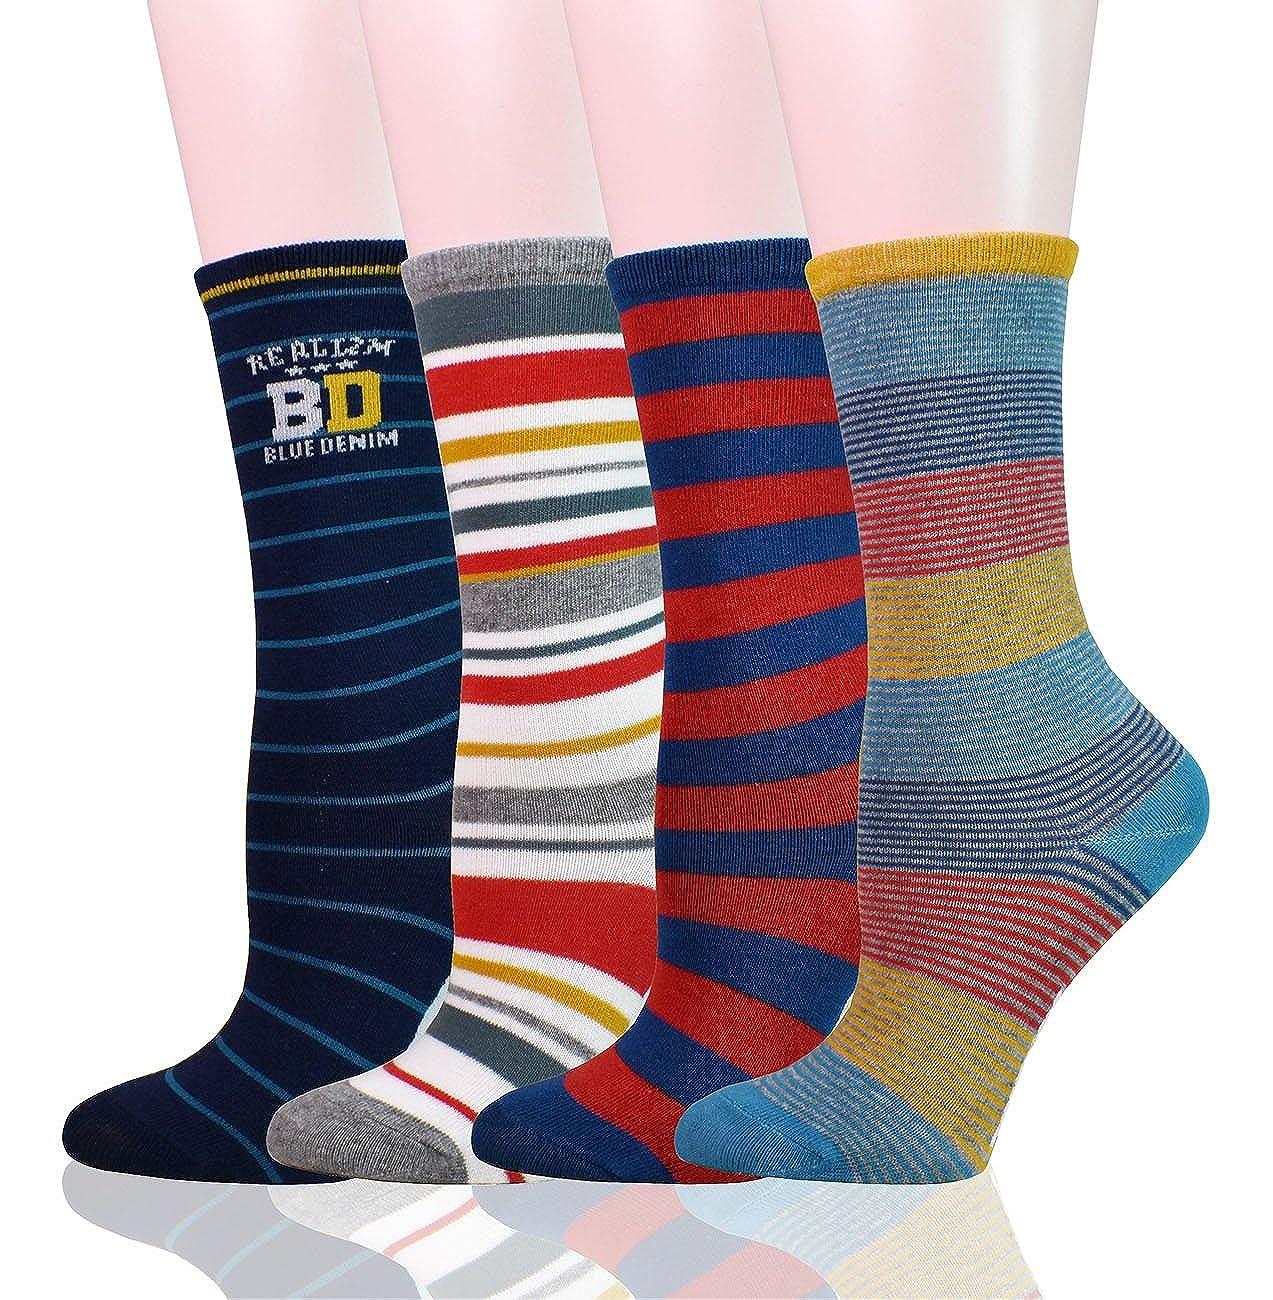 WEILAI SOCKS Child Toddler Kid Boy Colorful Casual Stripe Tube Crew Socks 4 Pack